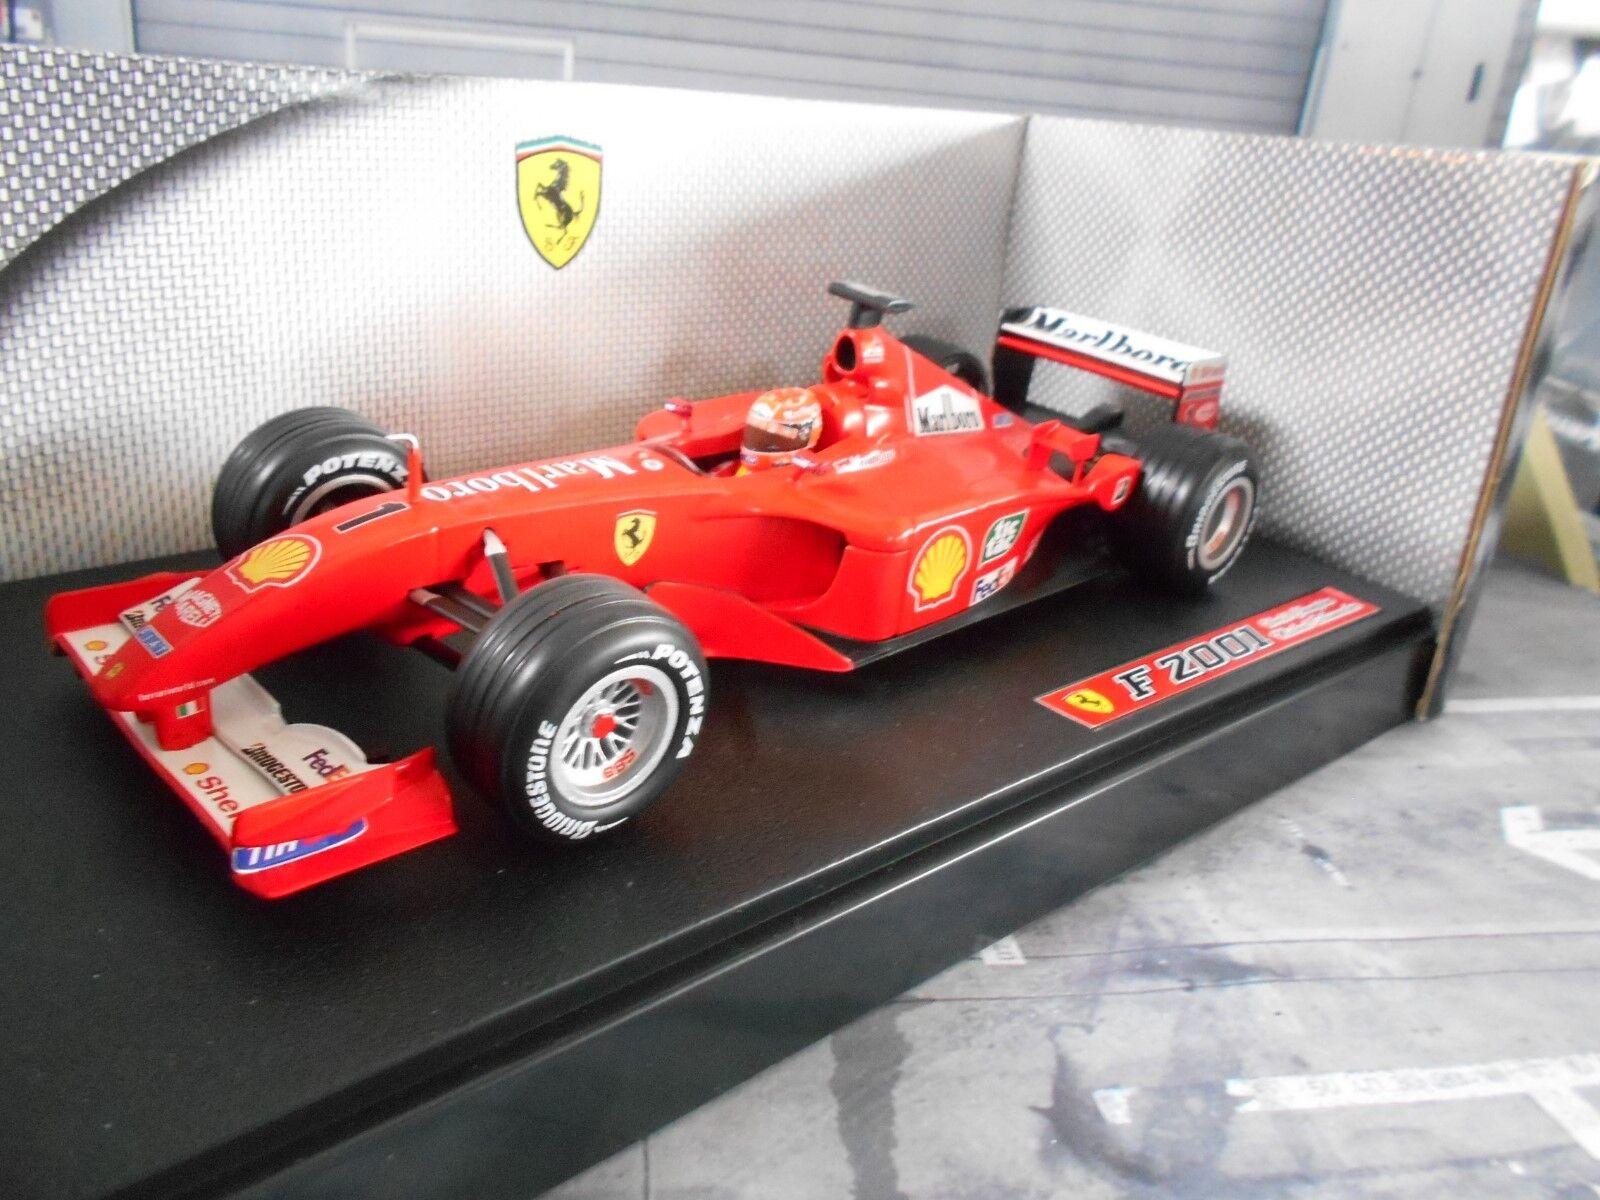 F1 FERRARI F2001  1 Michael Schumacher Saison 2001 Tabak Hot Wheels UMBAU 1 18    Moderne und elegante Mode